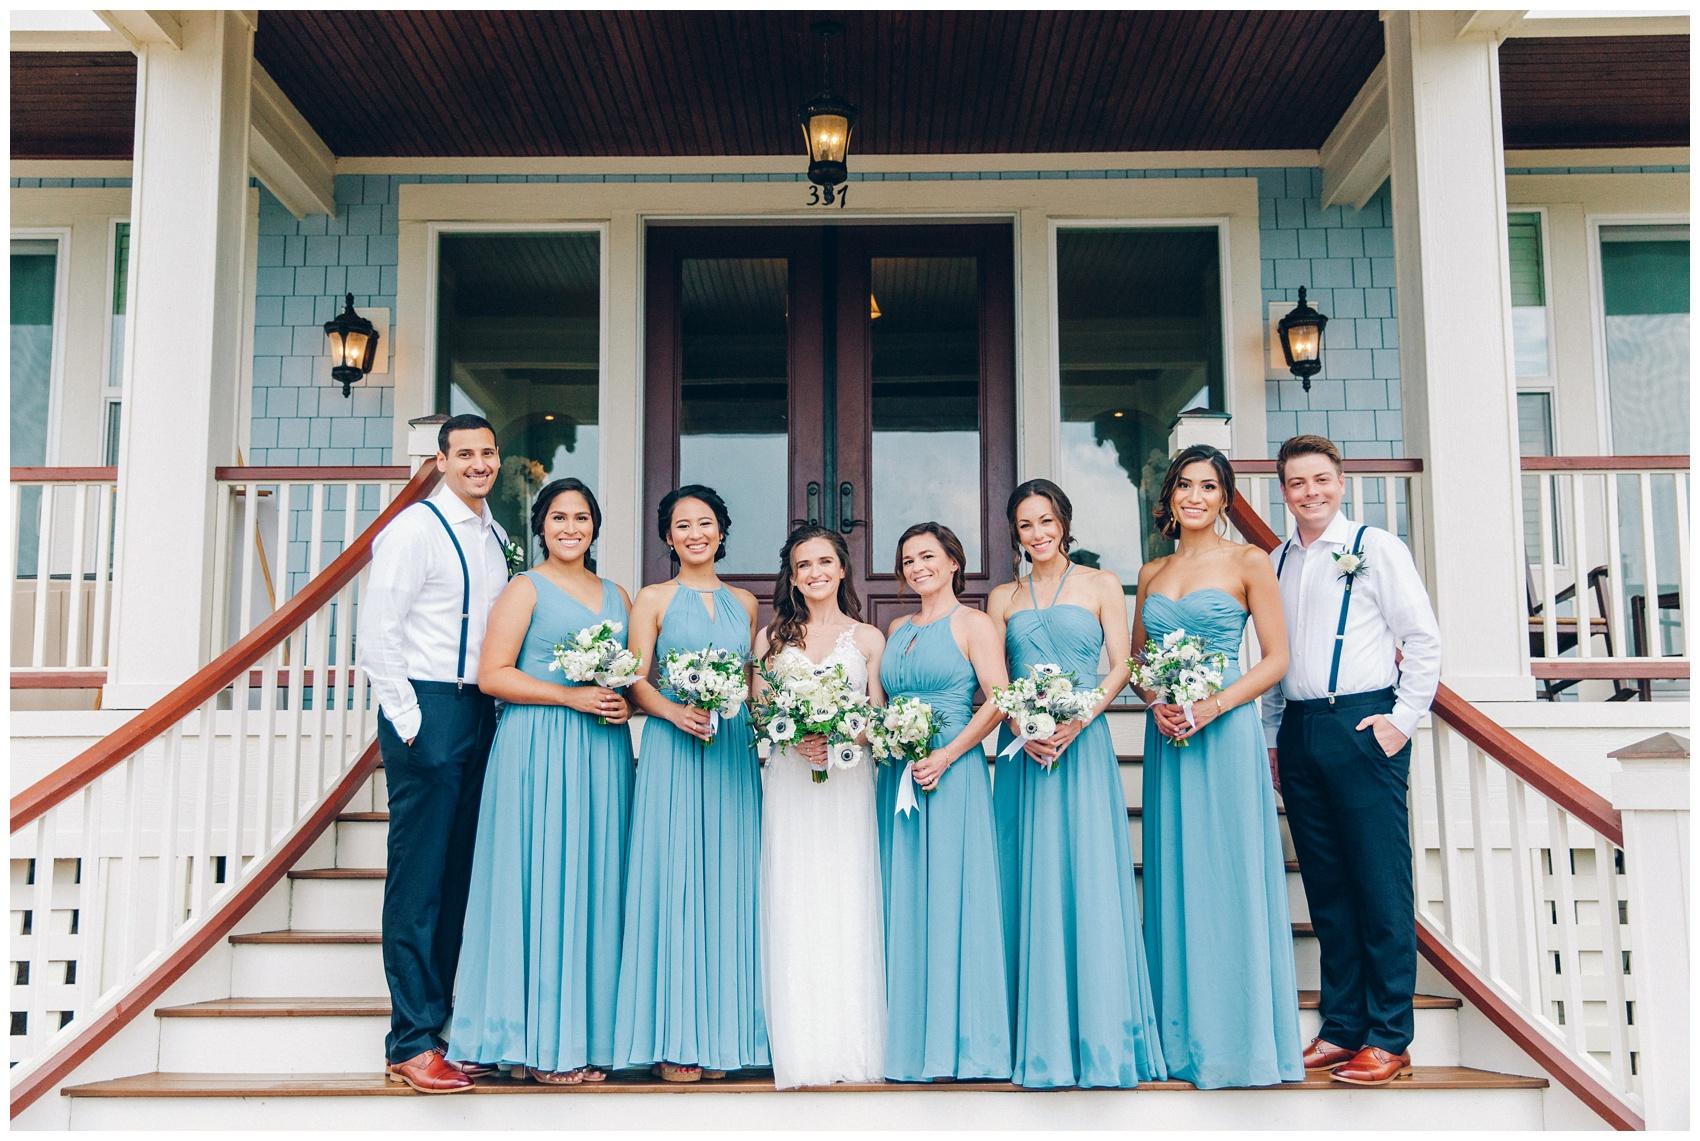 Outer-Banks-Corolla-Wedding_0046.jpg